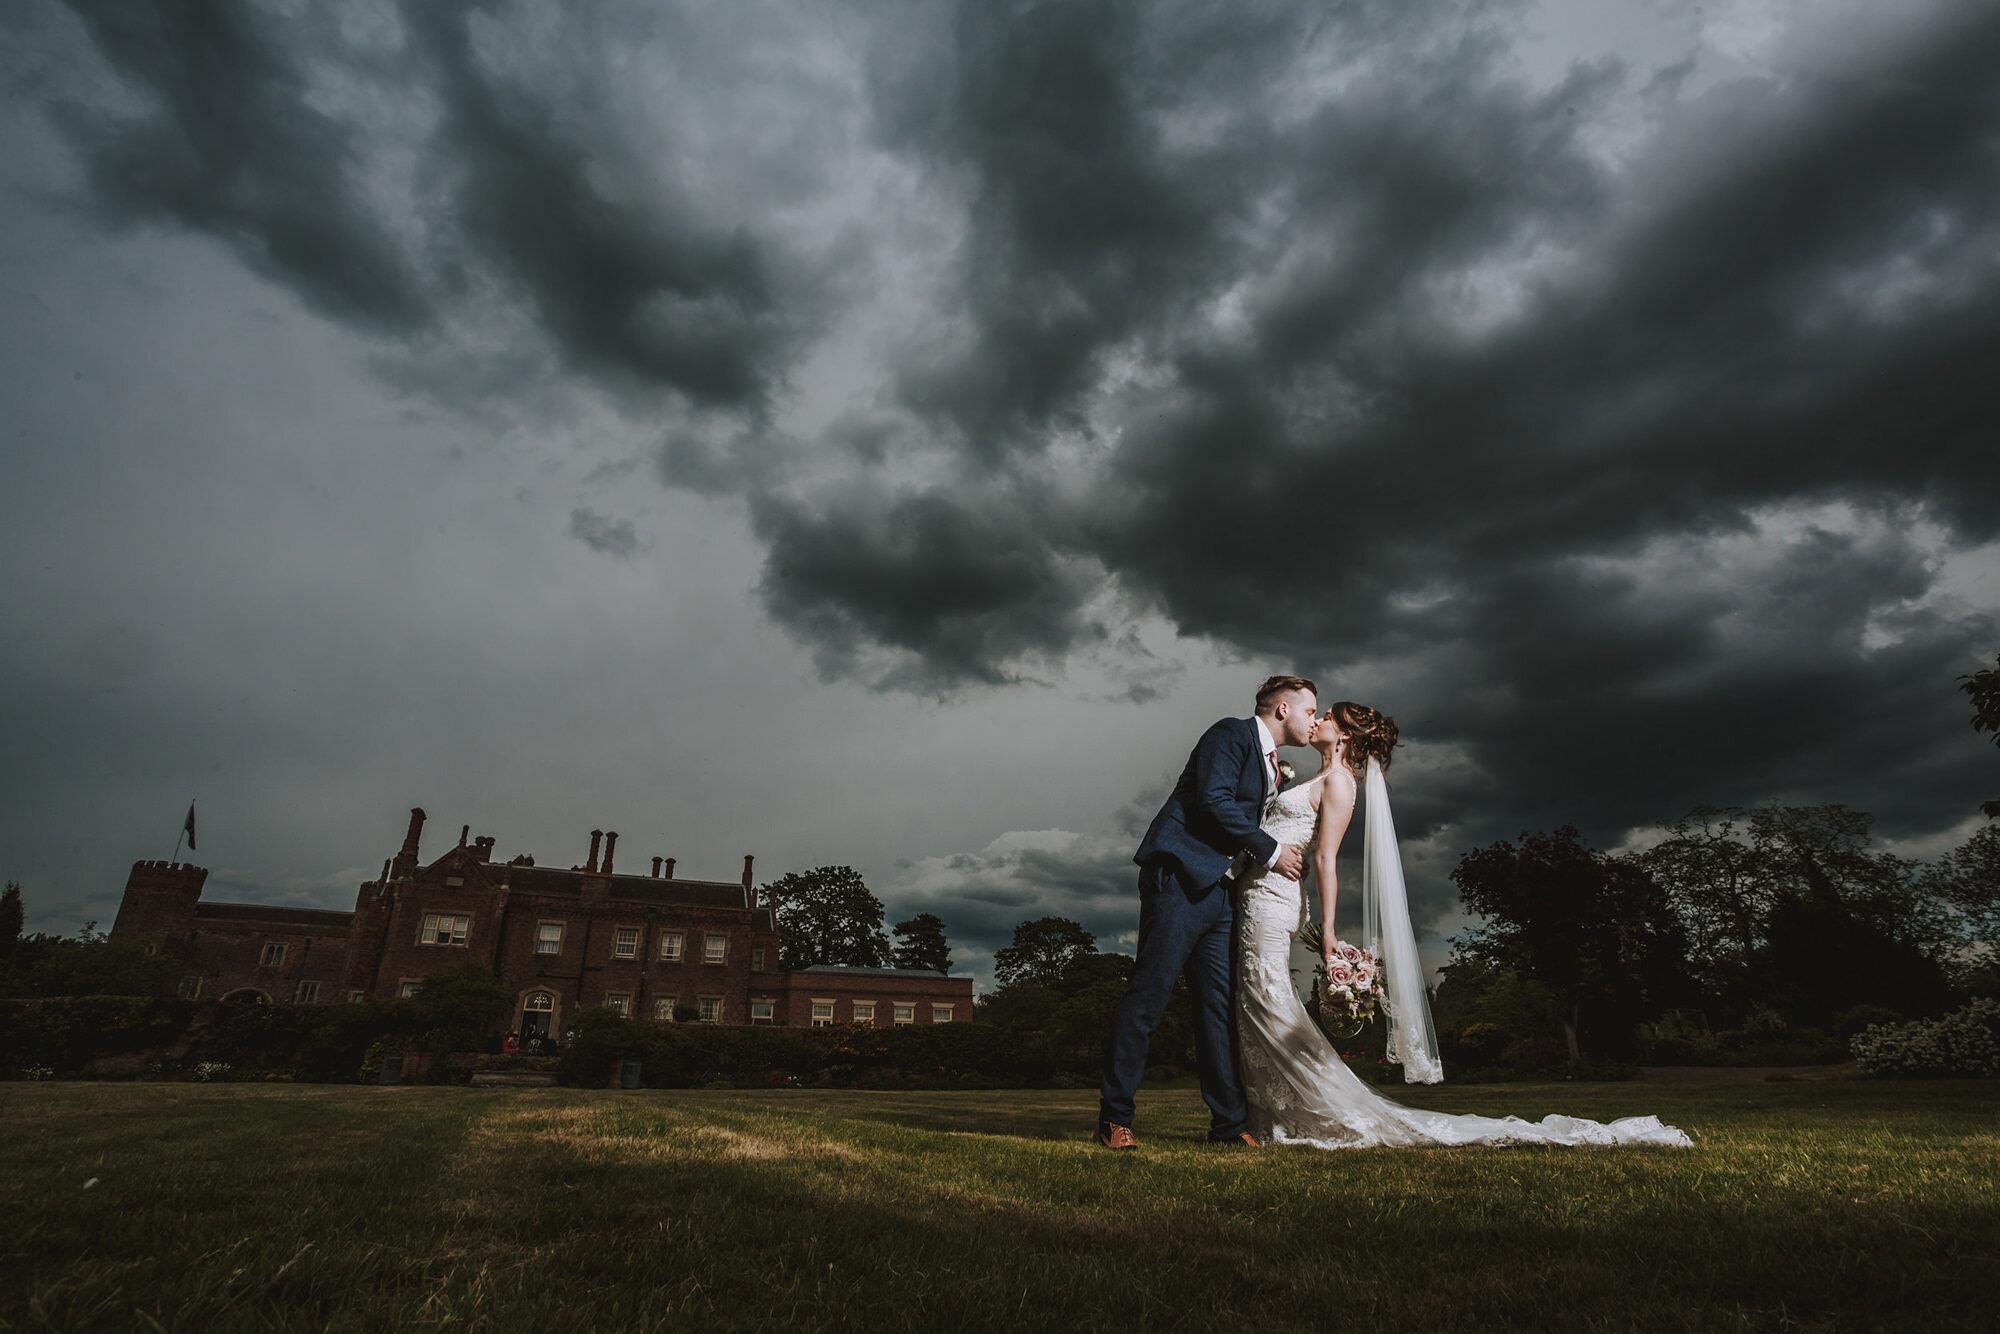 hodsock priory wedding photographers30.jpg